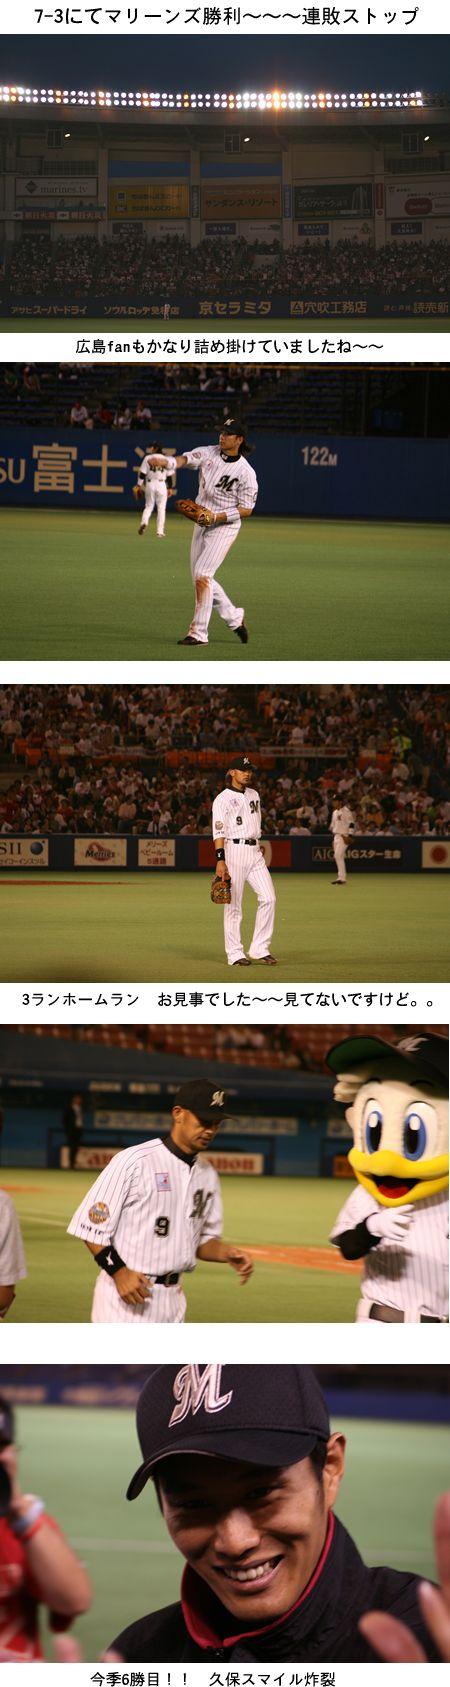 07-06-13-carp.jpg